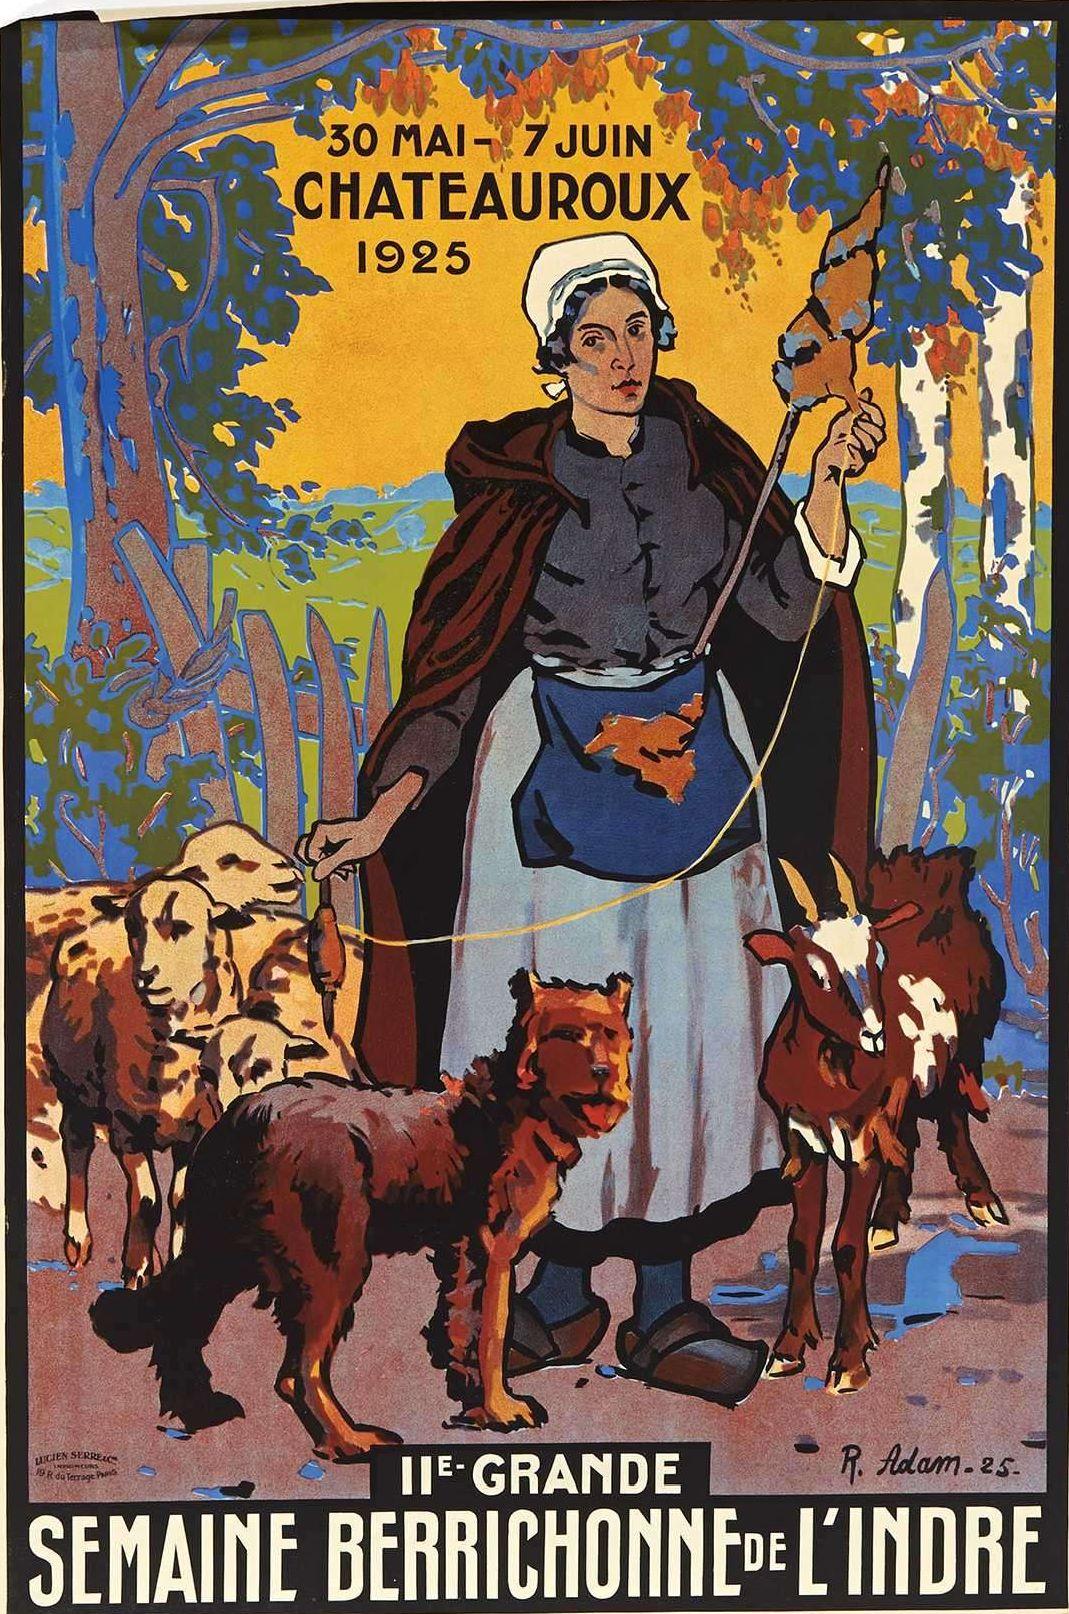 semaine berrichonne 1925.jpg